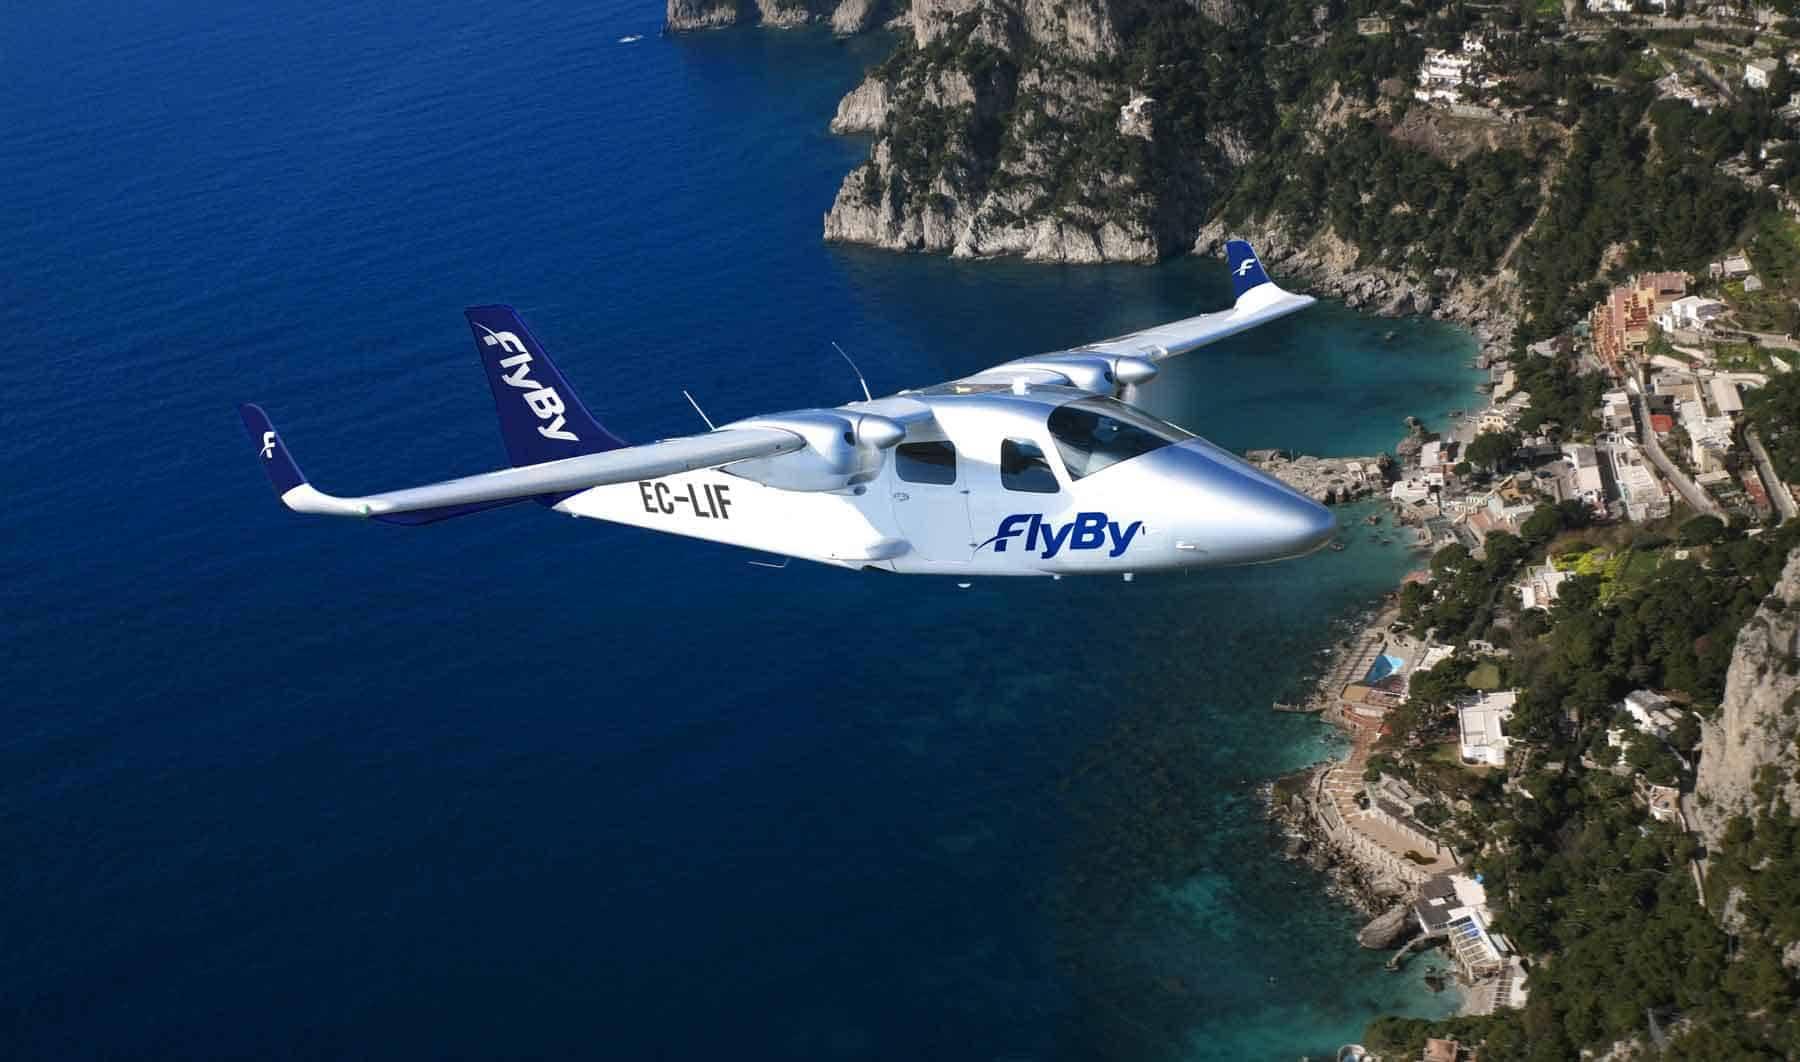 FlyBy Aviation Academy - school  | Photo 6 of 6 | Address: Aeropuerto de Burgos, Carr. de Logroño, 107, 09007 Burgos, Spain | Phone: +34 987 97 99 20